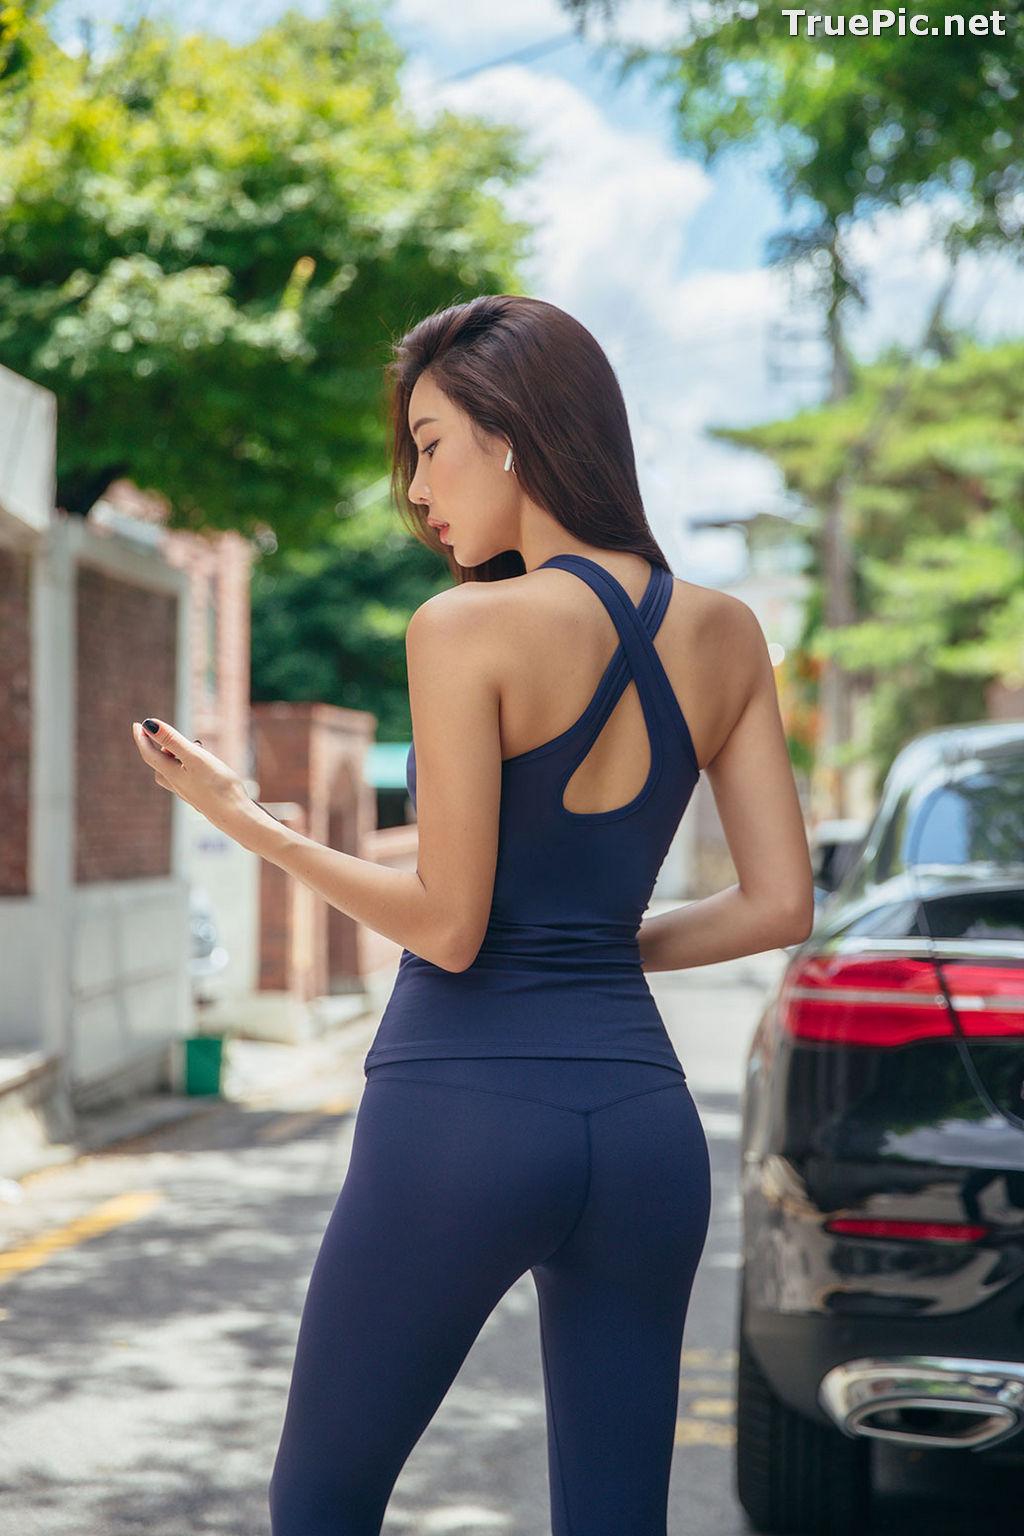 Image Korean Fashion Model - Park Da Hyun - Navy Sportswear - TruePic.net - Picture-17